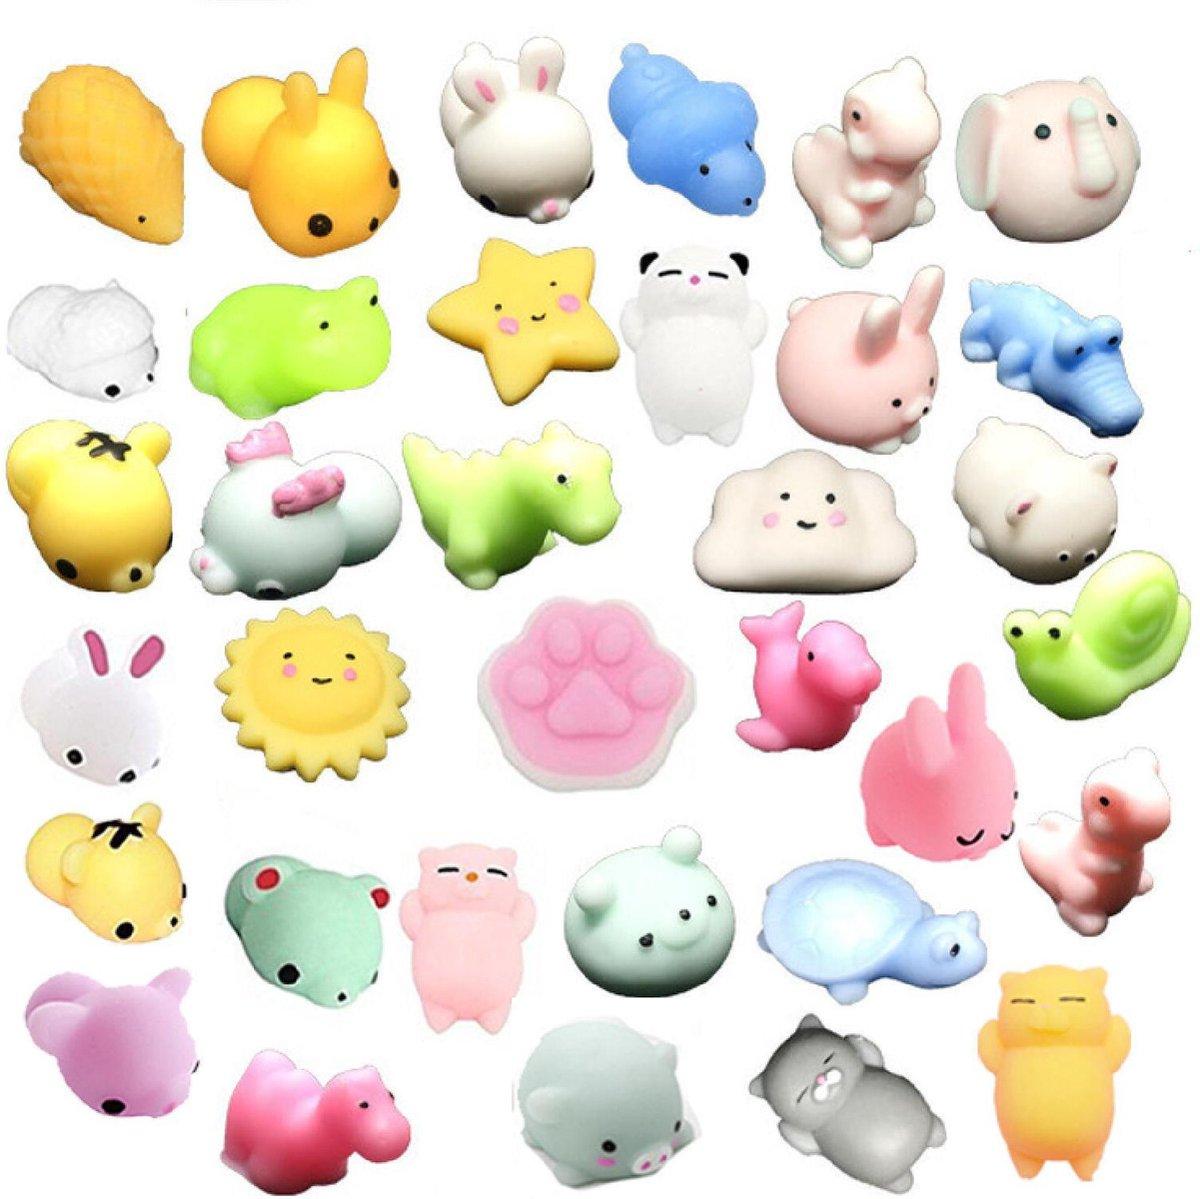 Mochi squishy  - Squishy - Mochi - 5 stuks - Fidget toys - Anti stress - Pop All Up®